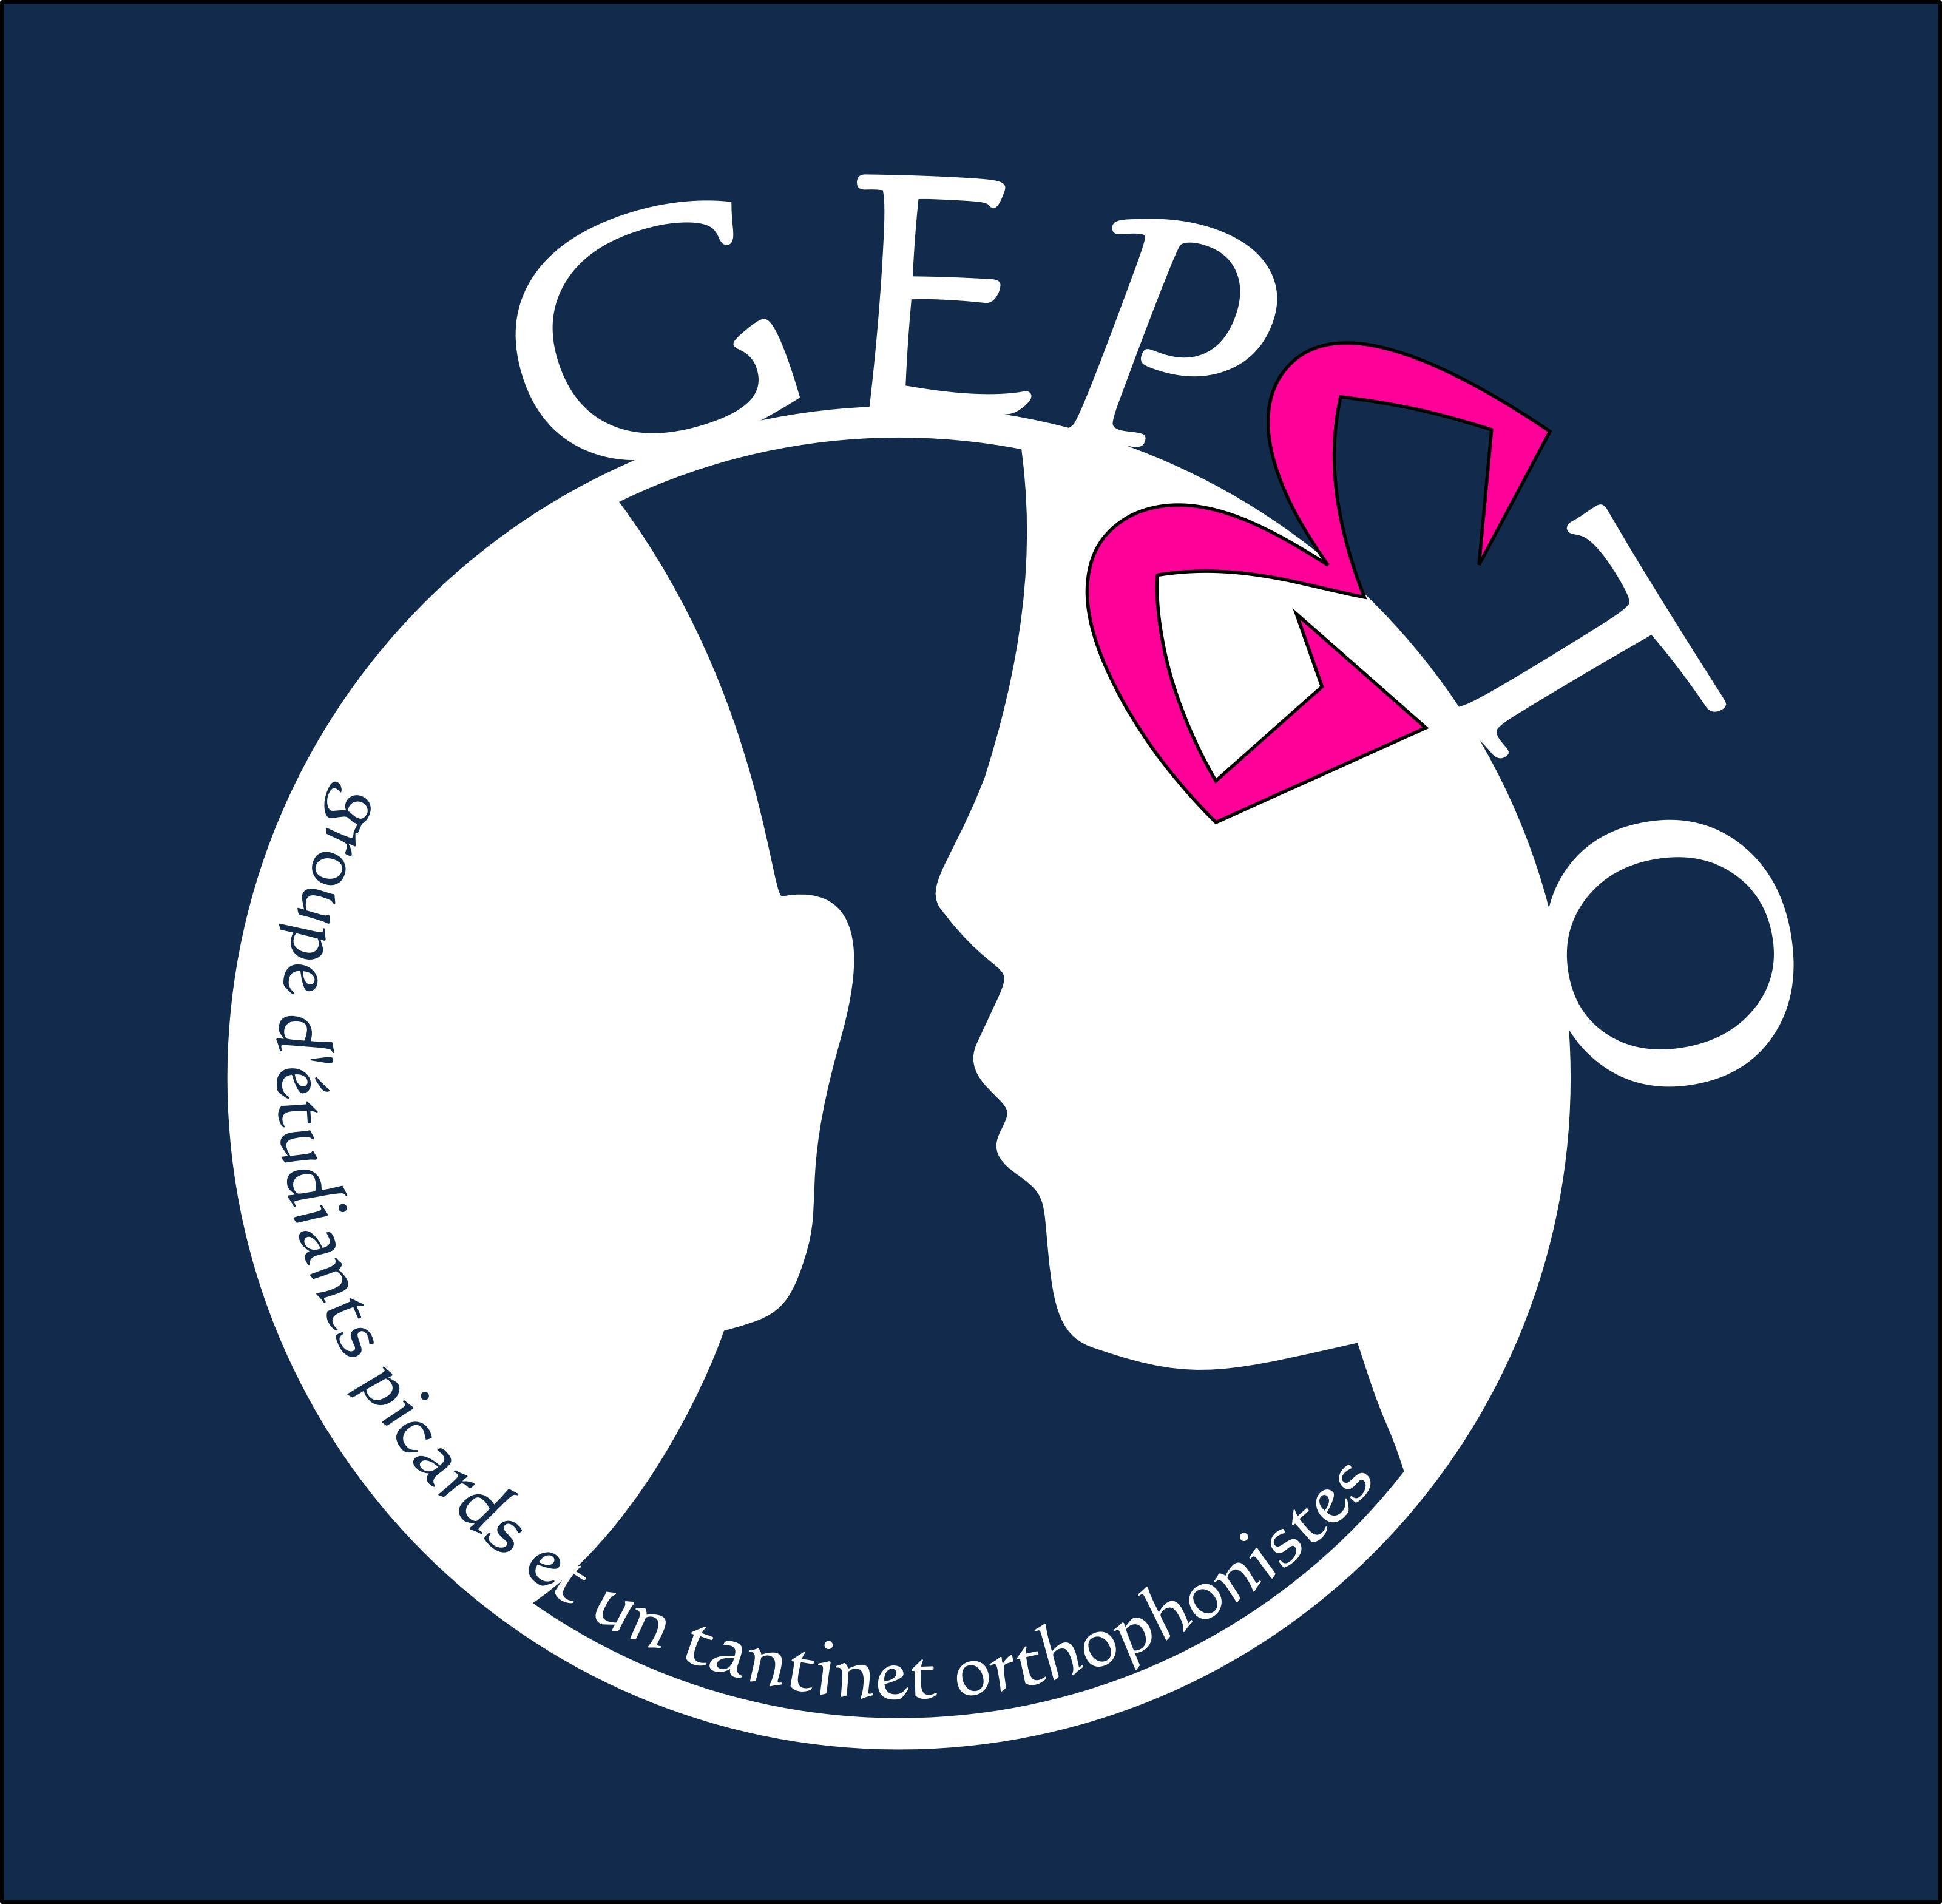 Logo gepeto.jpeg